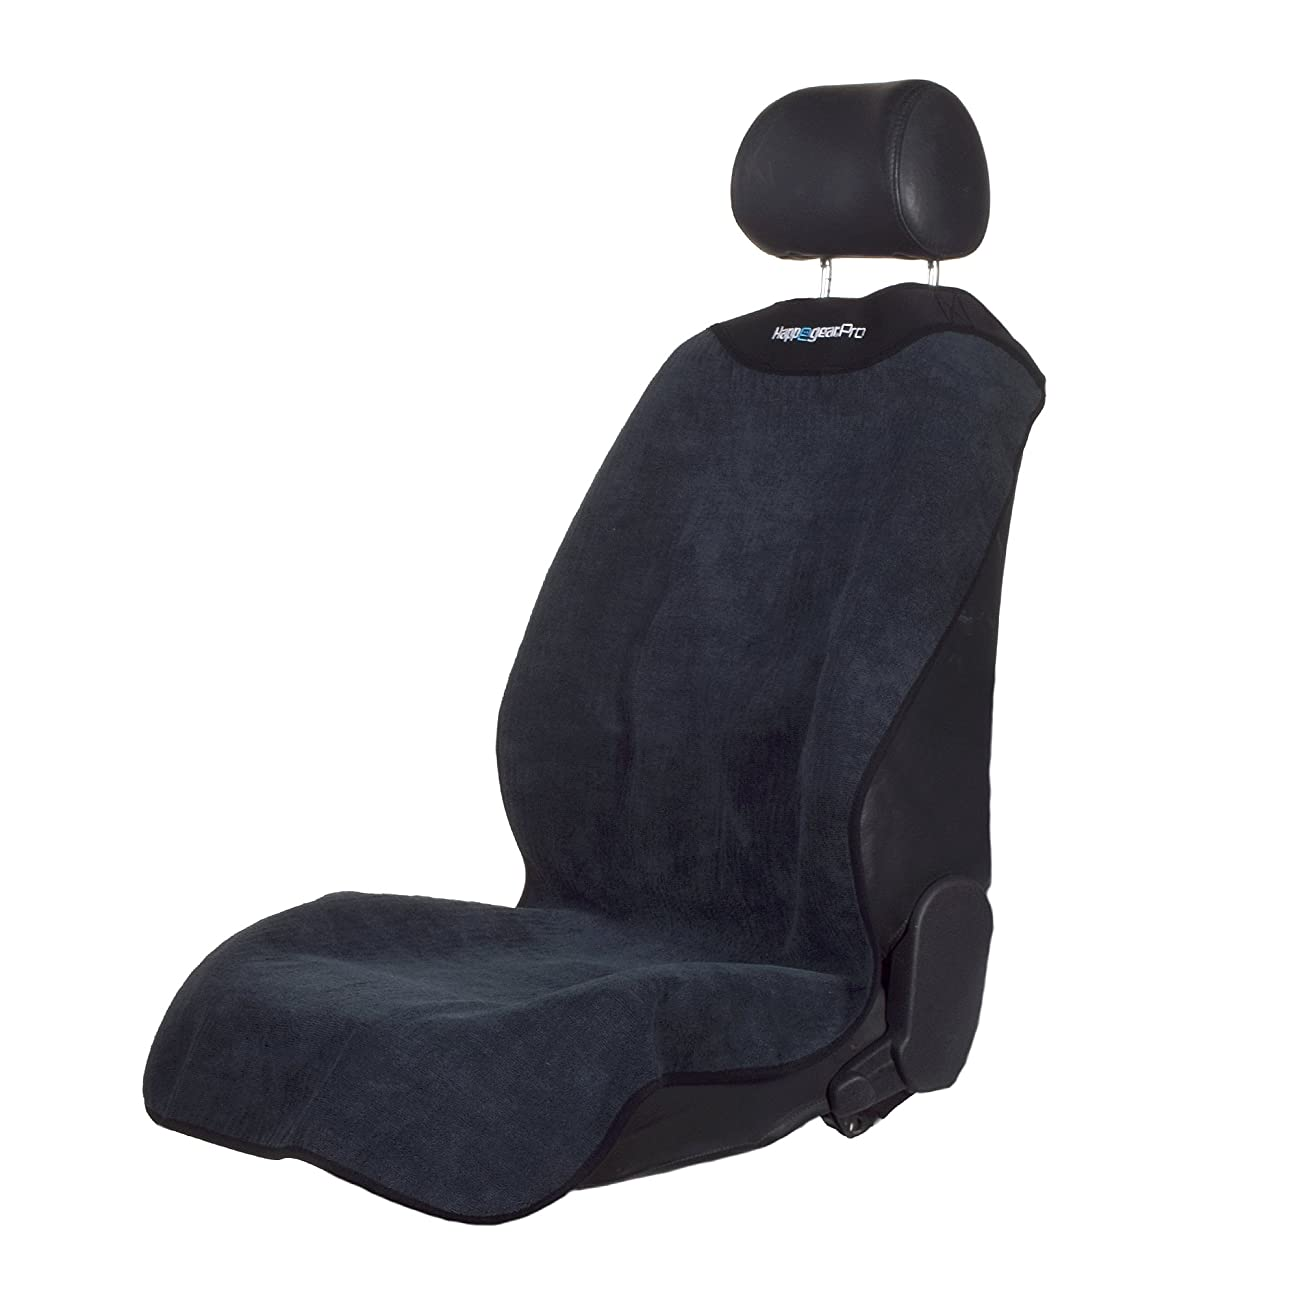 HAPPEGEAR HappegearPro Waterproof Athletic Car Seat Protector